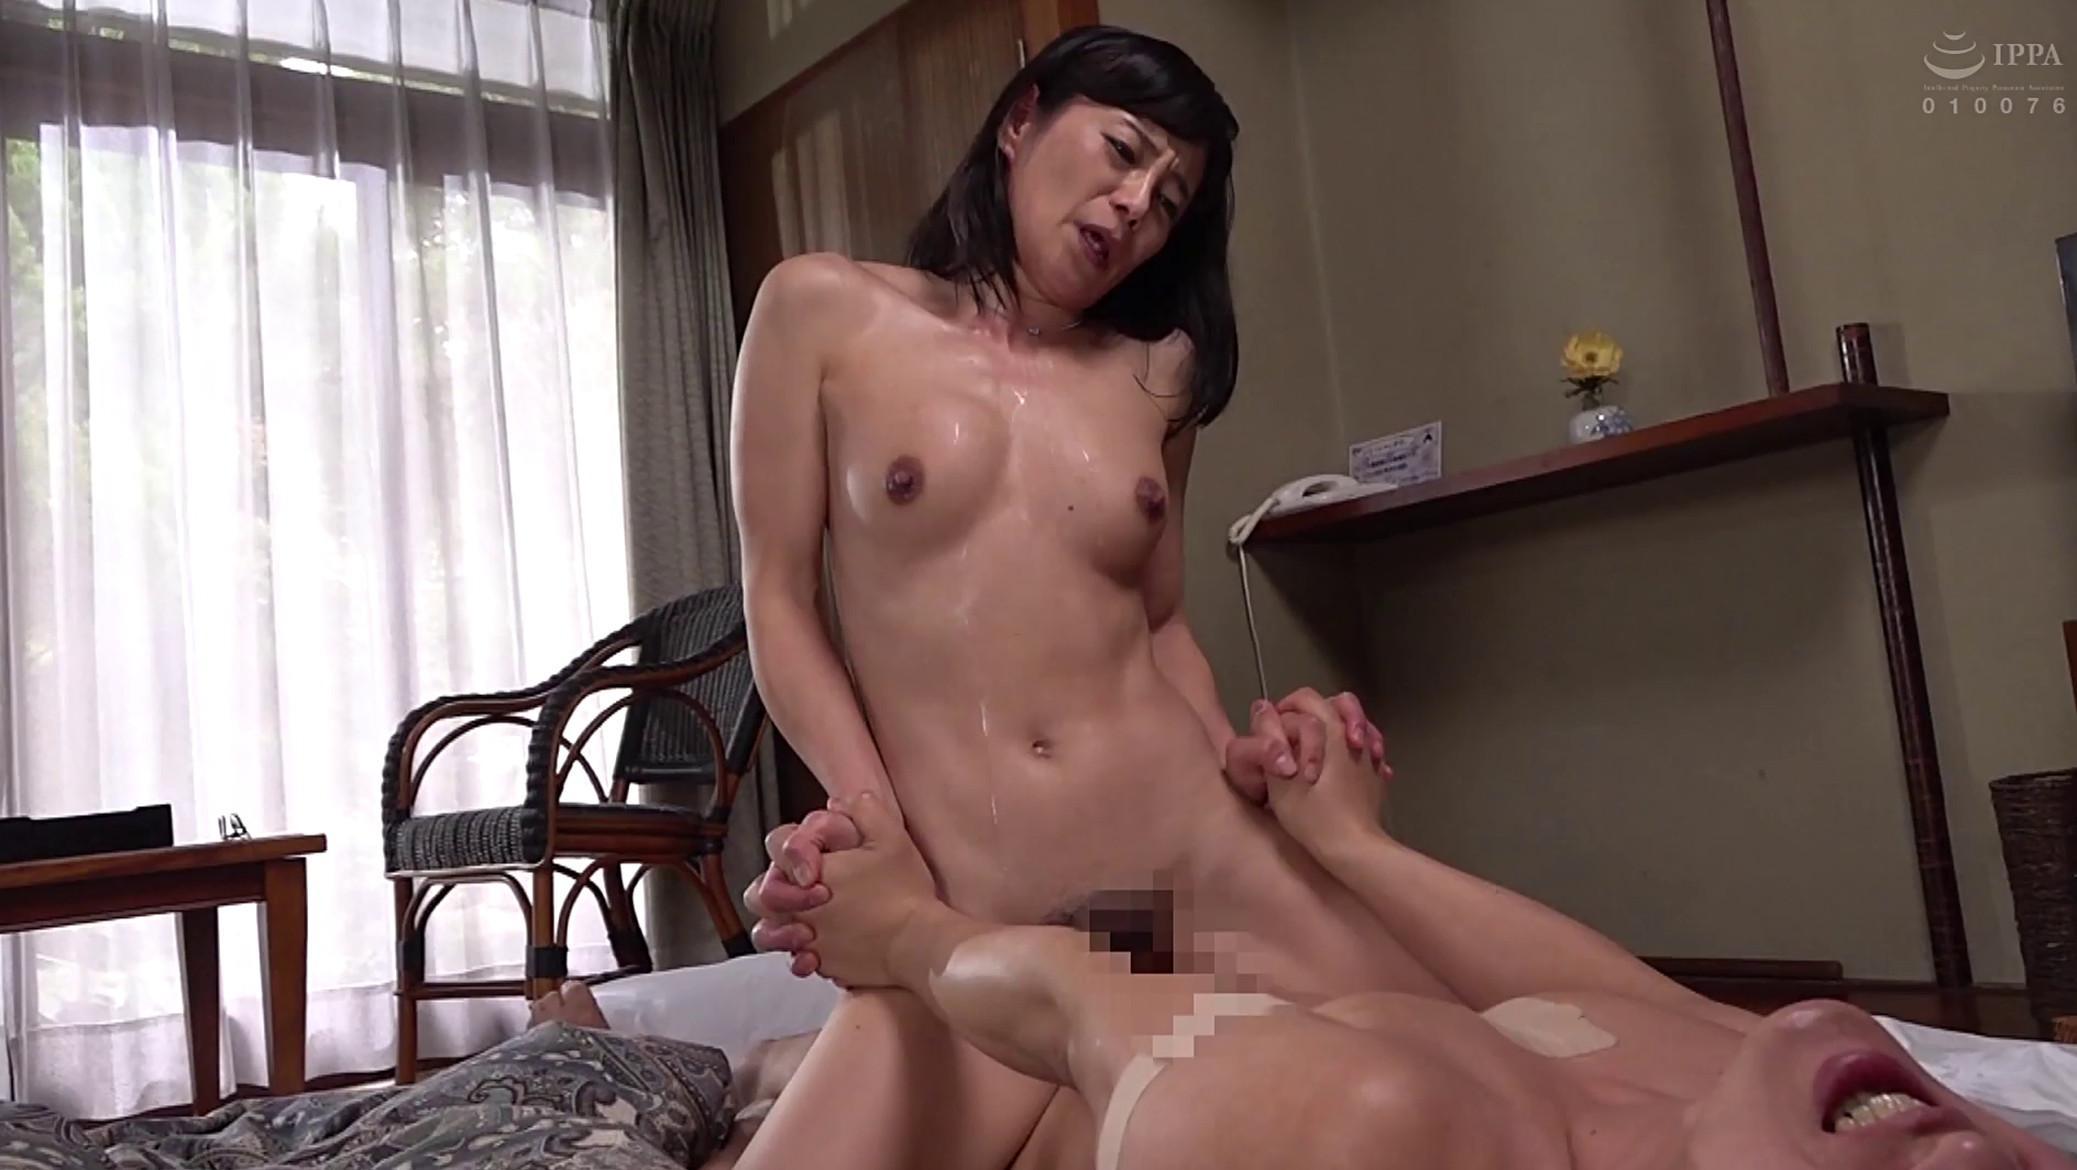 Japanese mature Rieko Hiraoka cowgirl sex pics